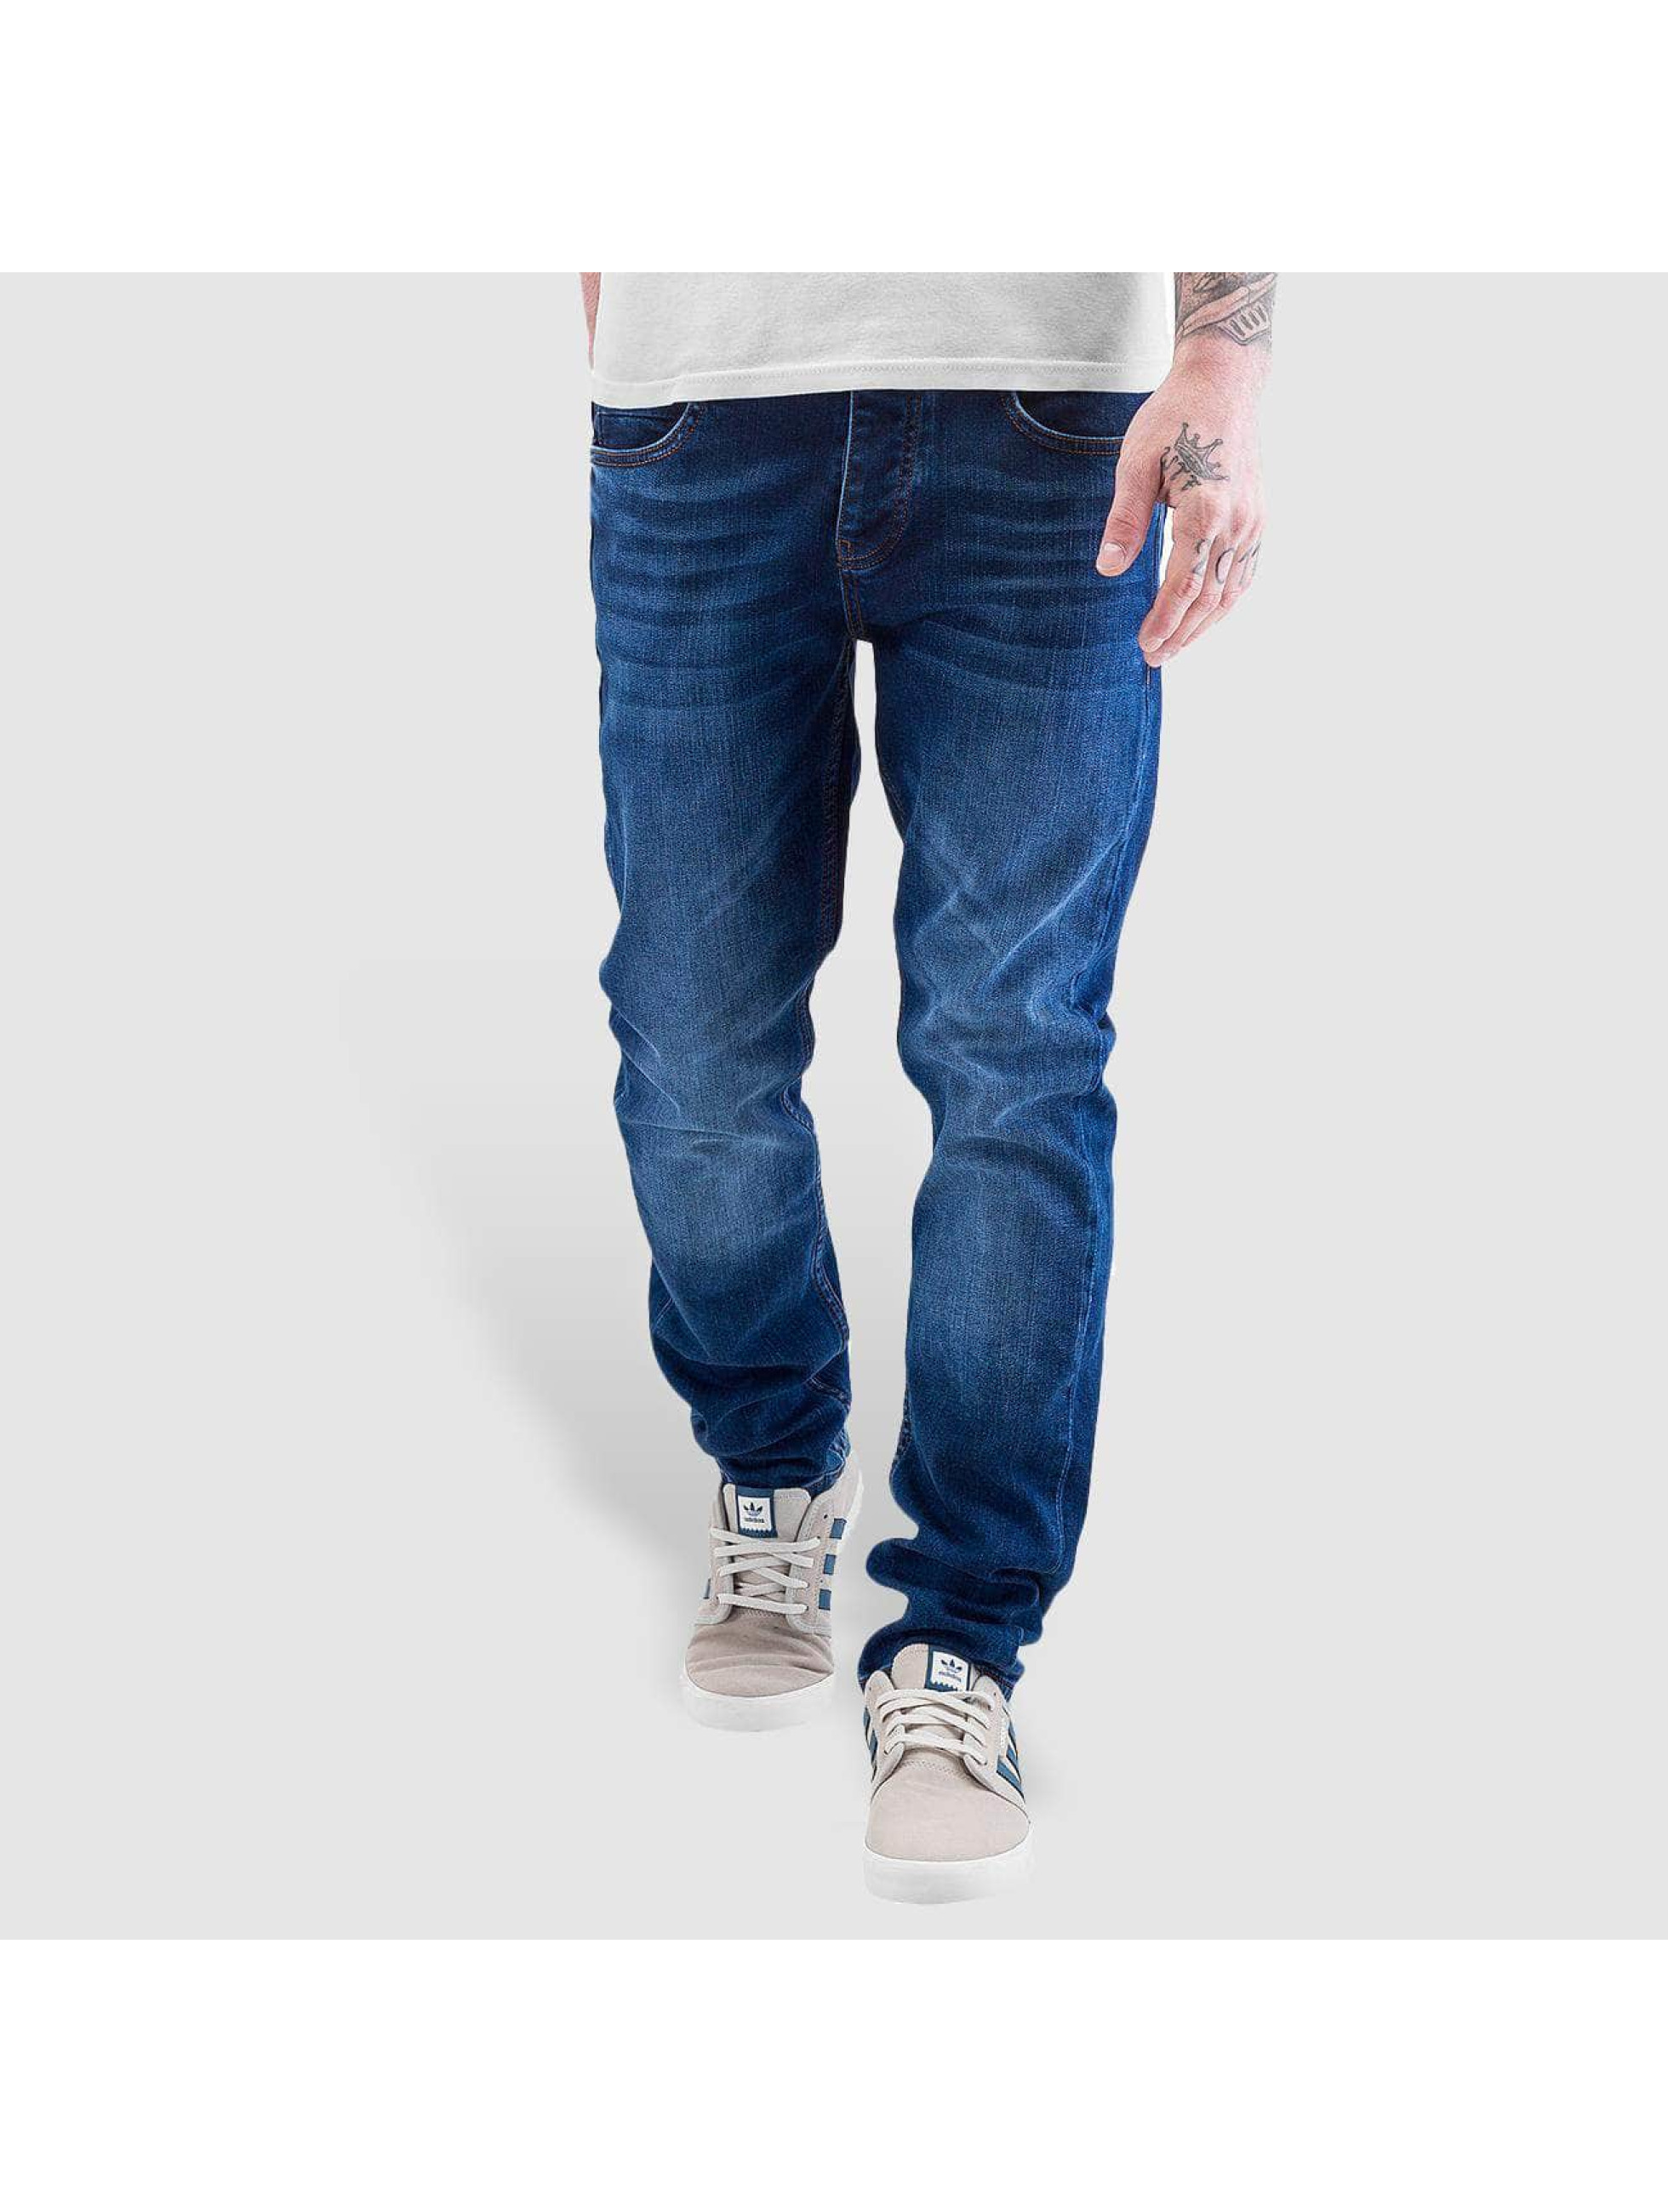 Just Rhyse Облегающие джинсы Slimfit синий